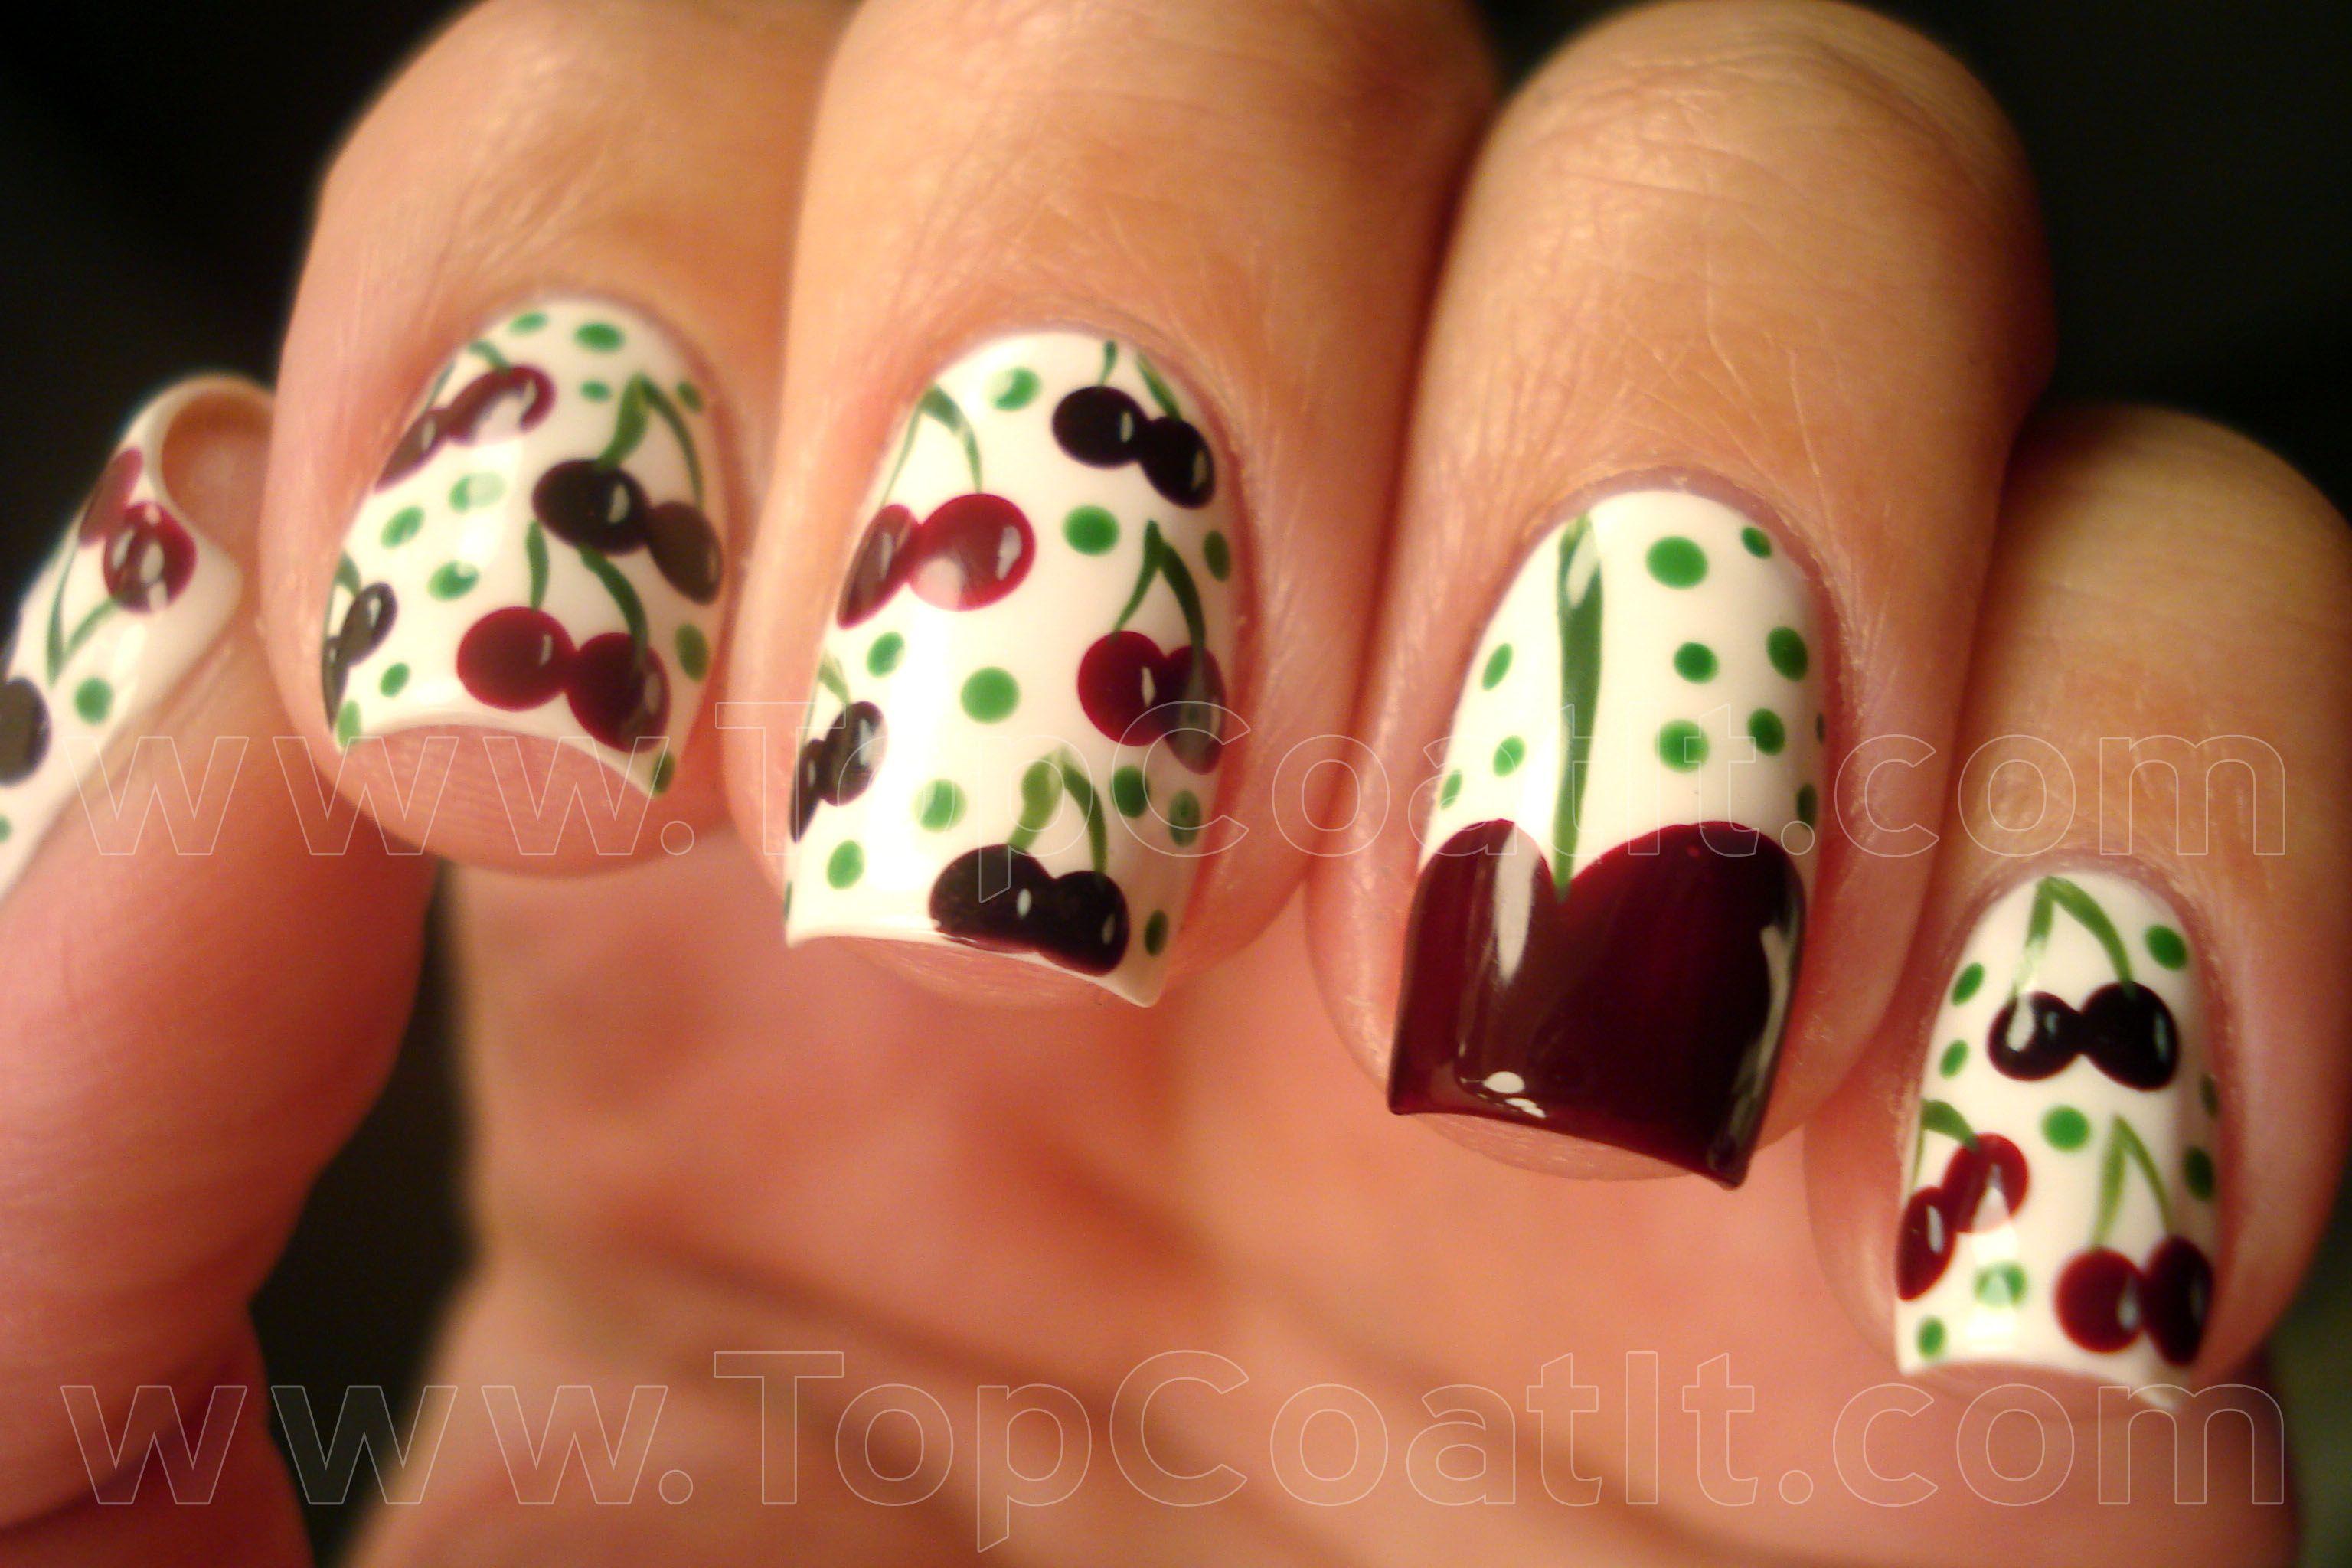 Cherries (in the snow?)